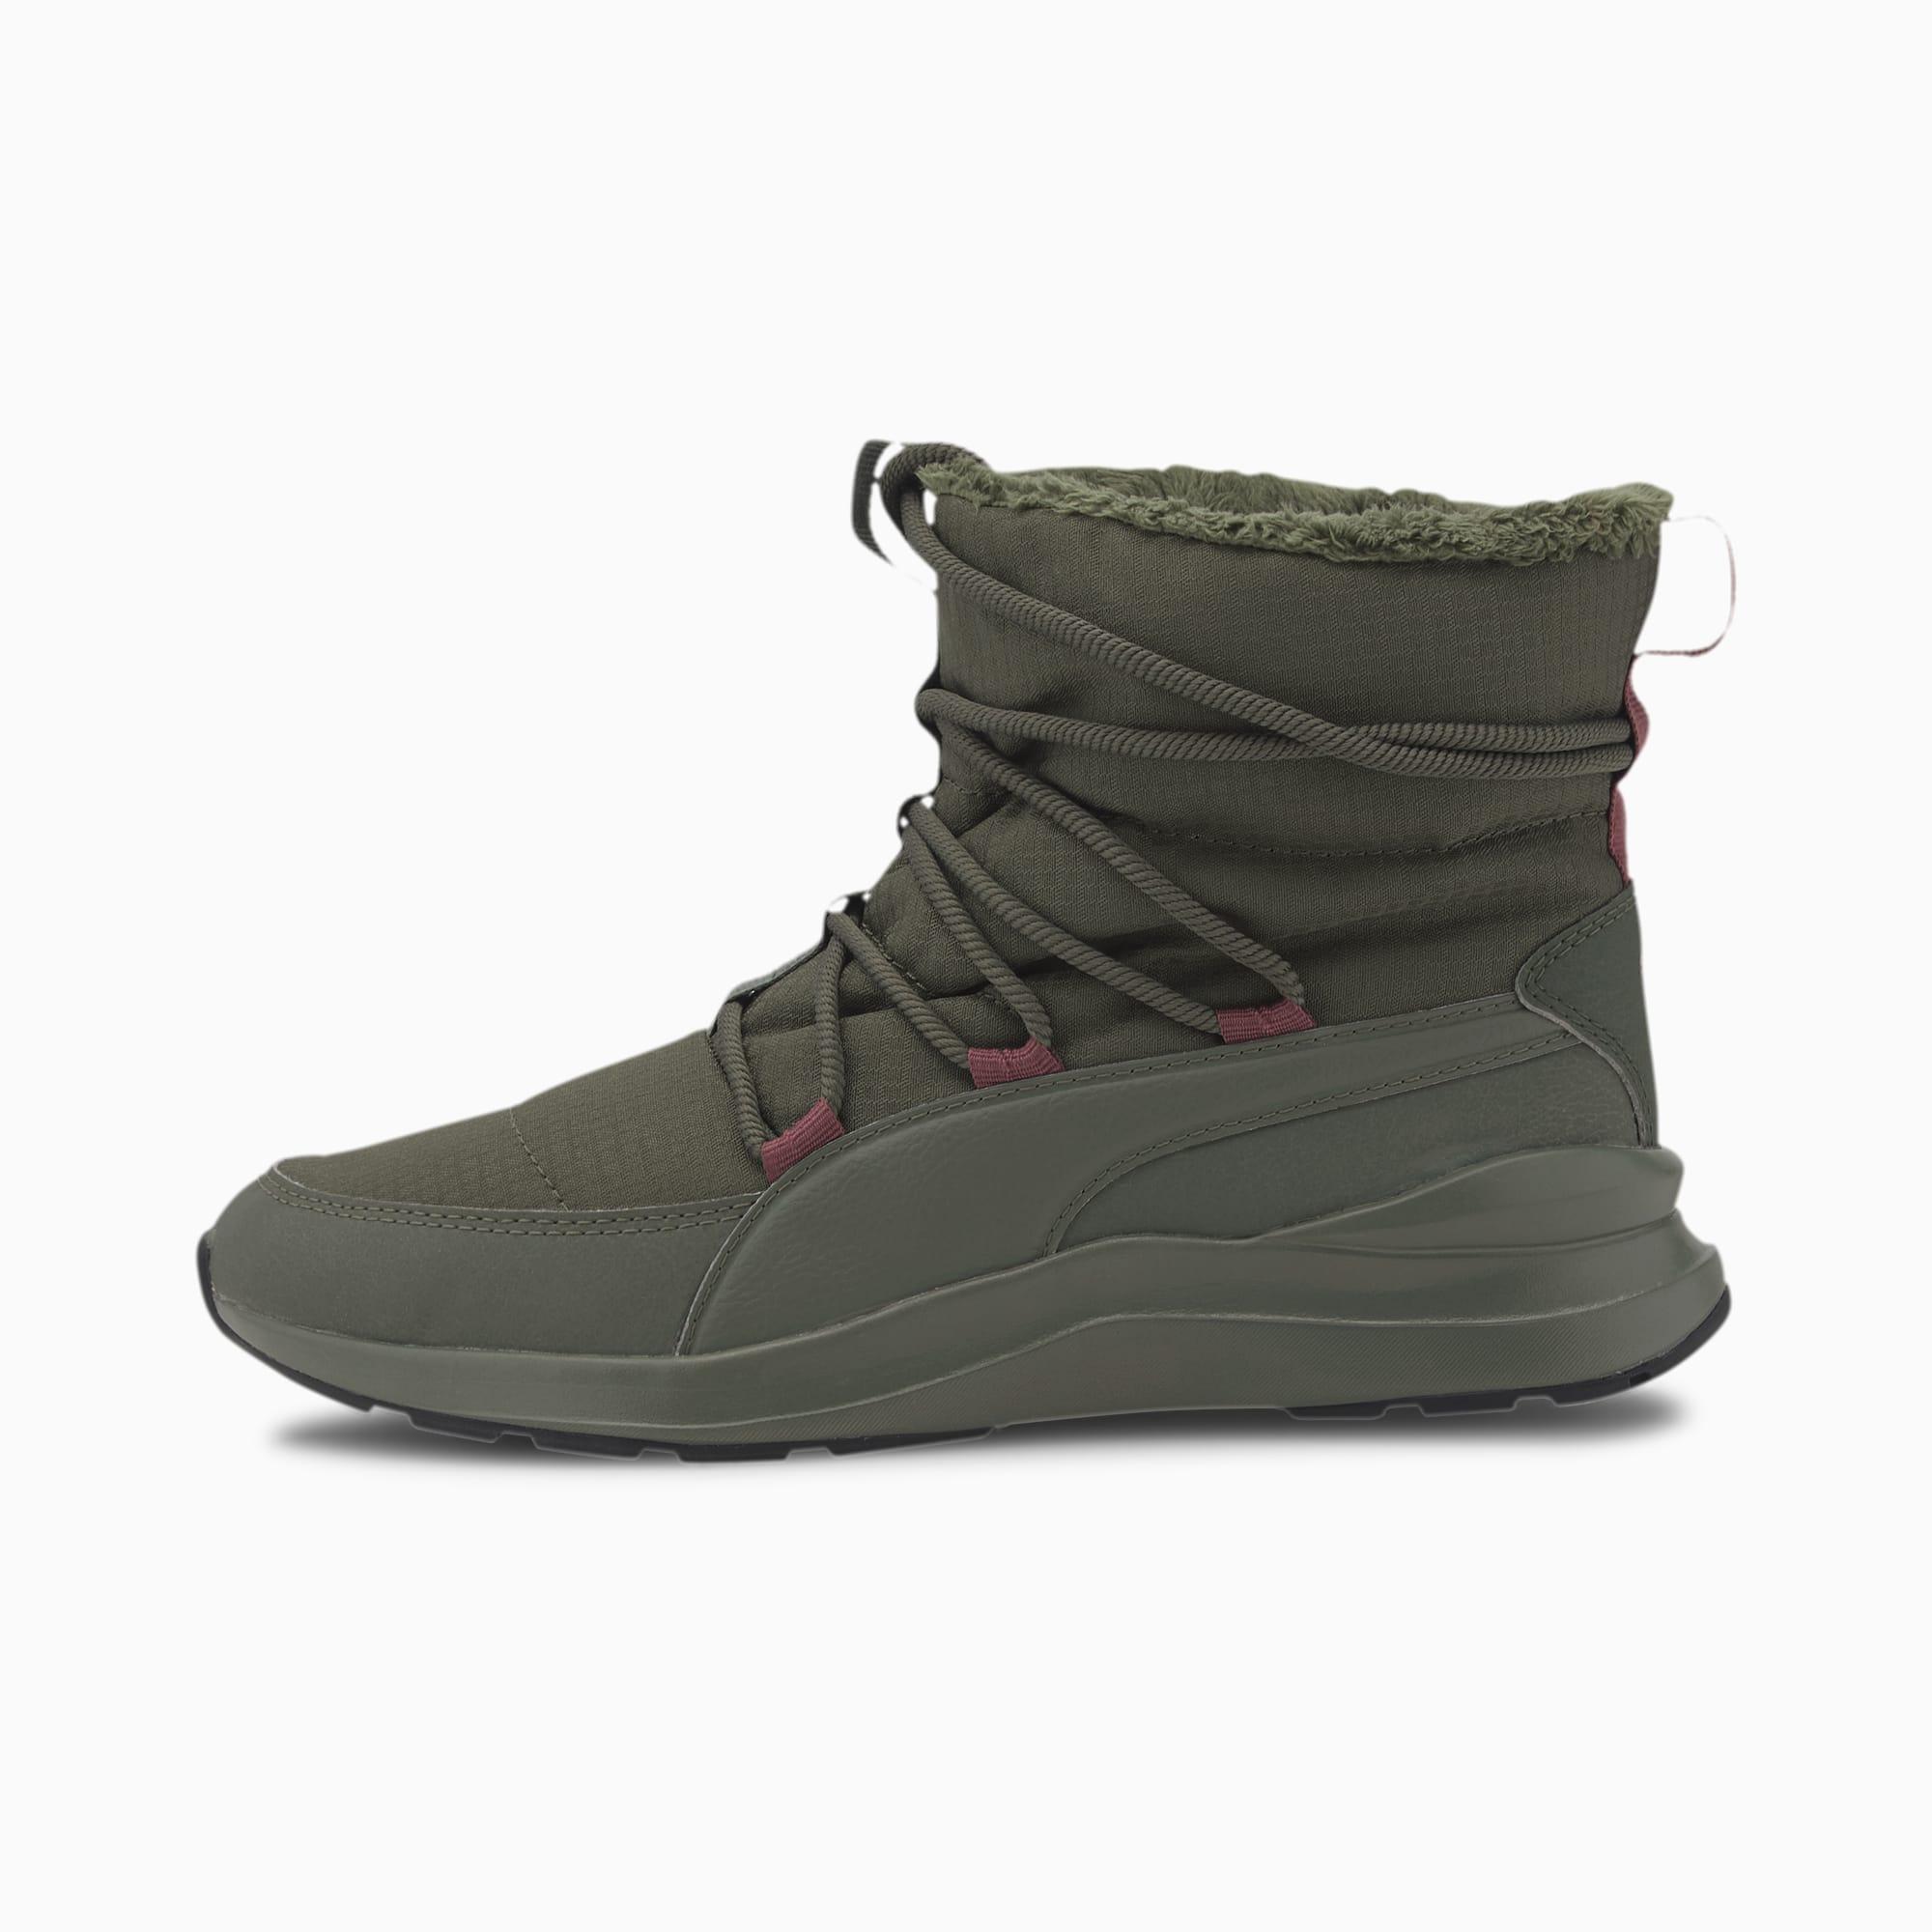 PUMA Chaussure Bottine d'hiver Adela pour Femme, Vert, Taille 36, Chaussures